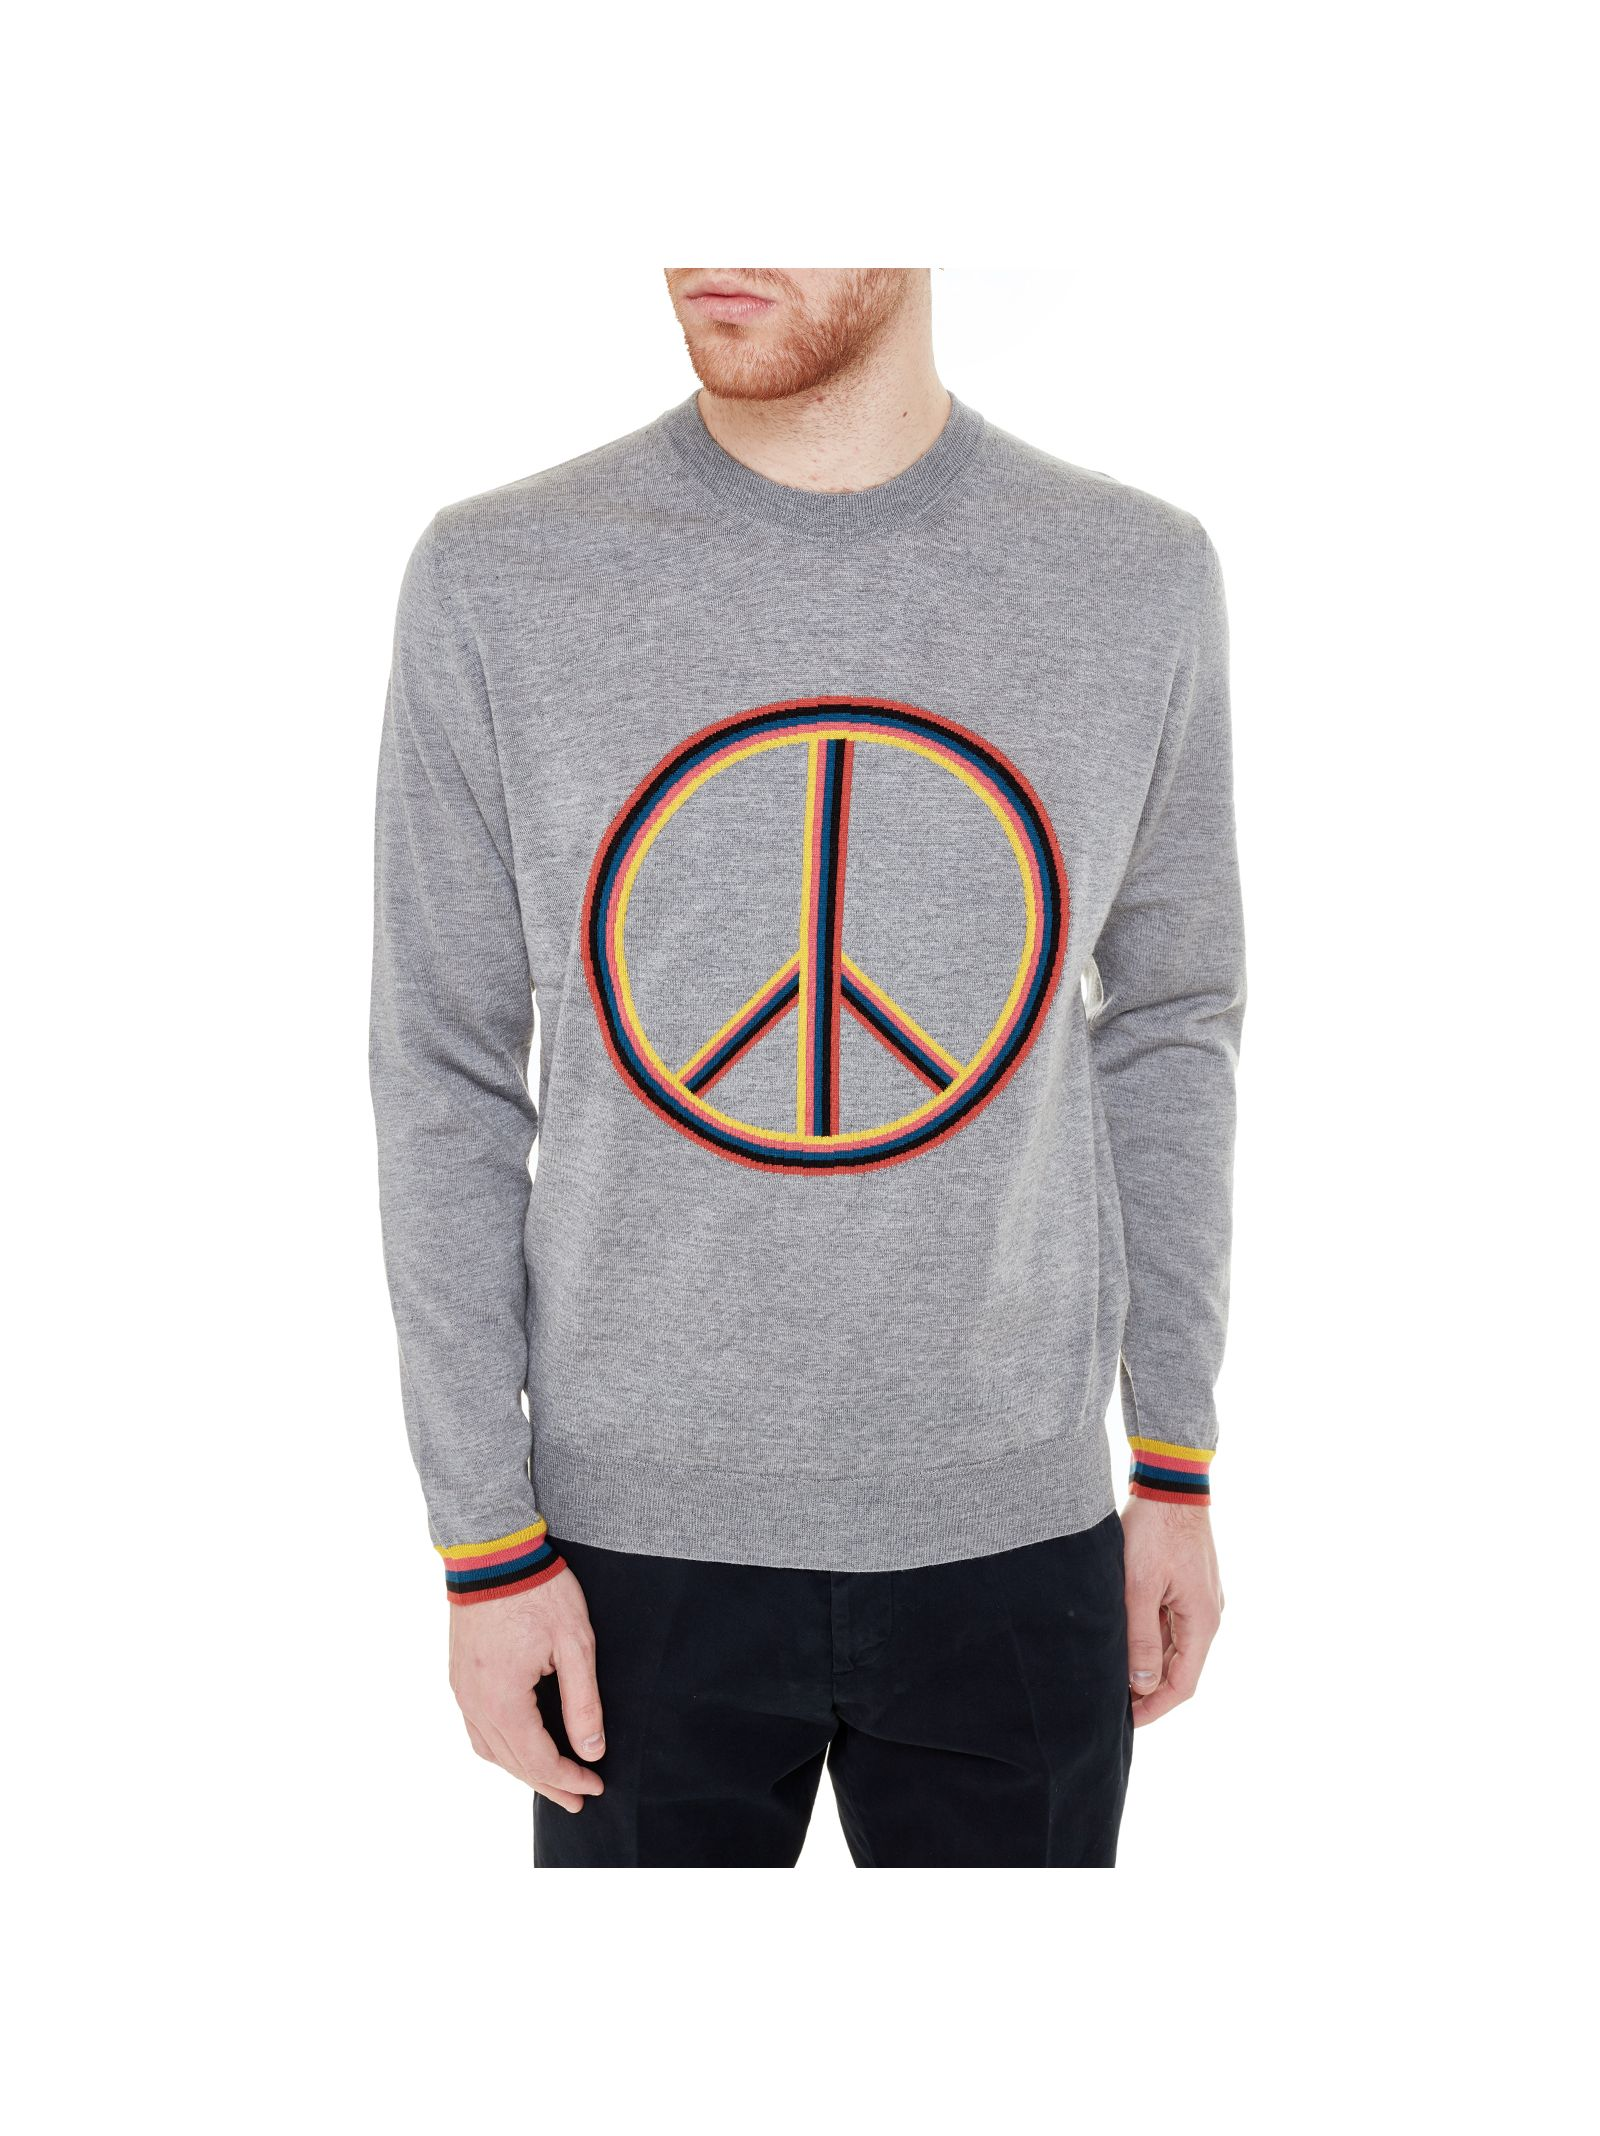 Paul Smith Peace Sign Sweater